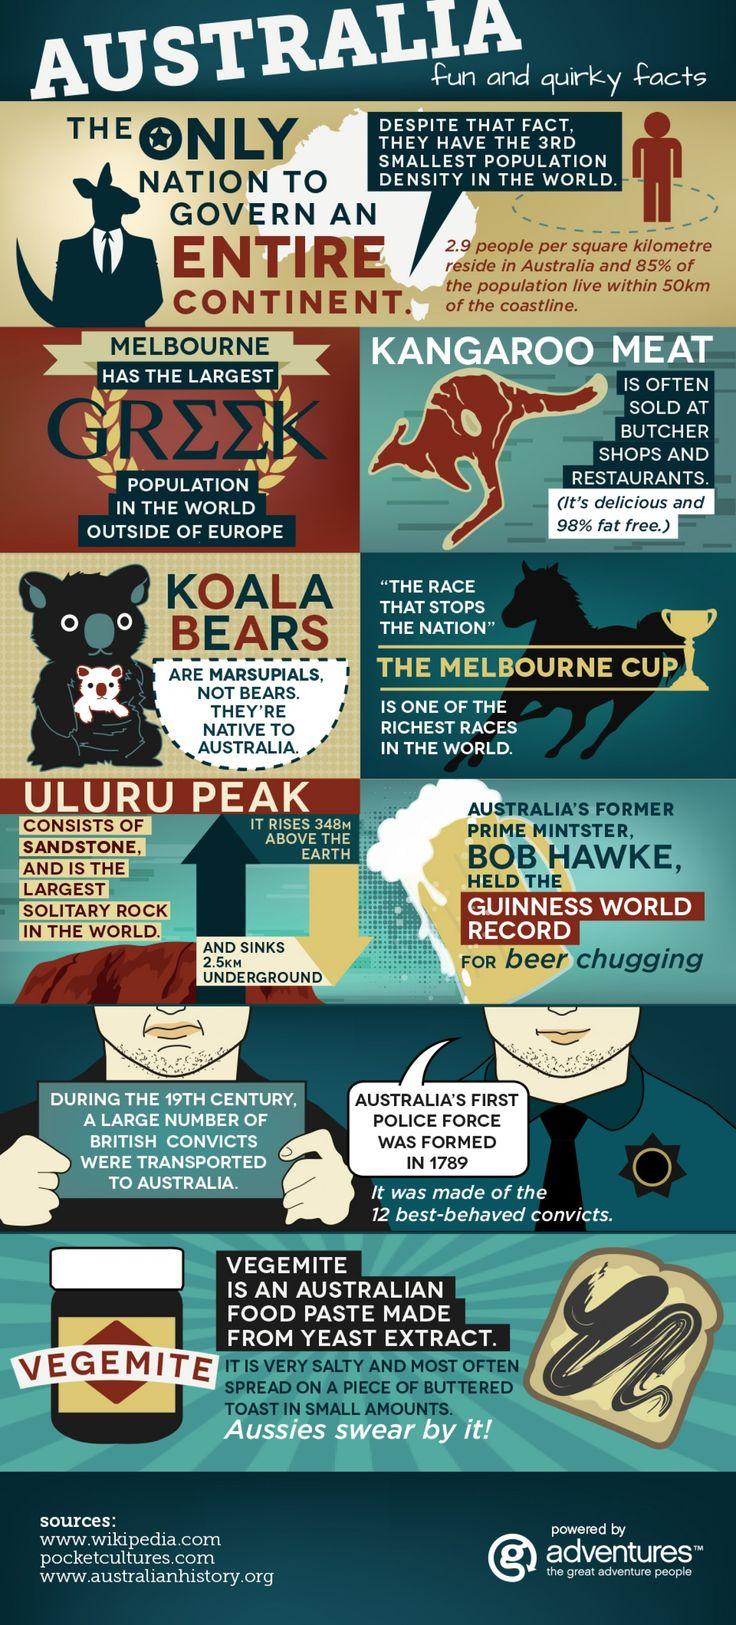 #Australia Fun Facts  #Infographic